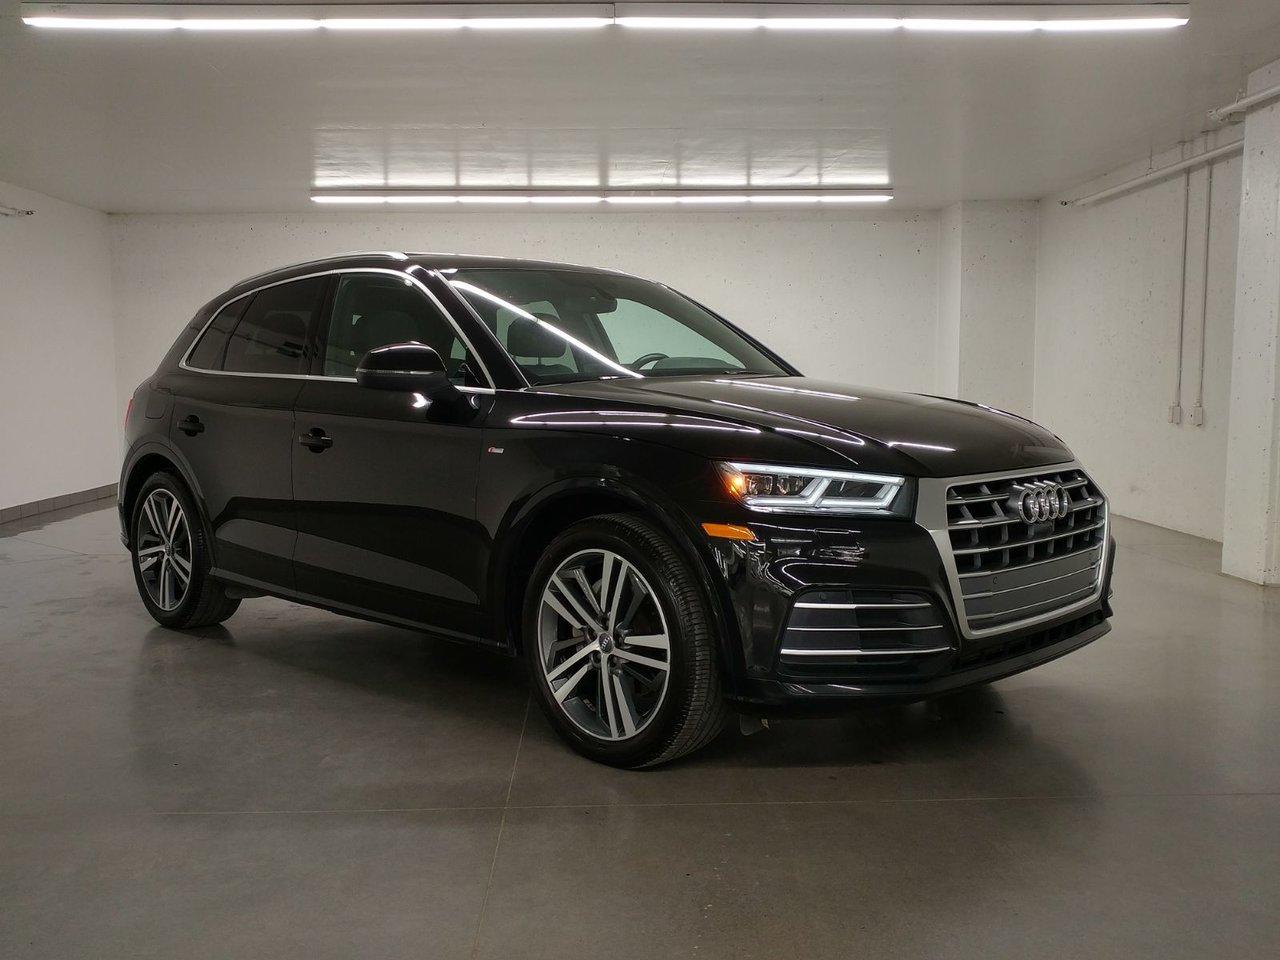 Audi Q5 2018 TECHNIK S-LINE NAV   TOIT   SUSPENSION PNEUMA